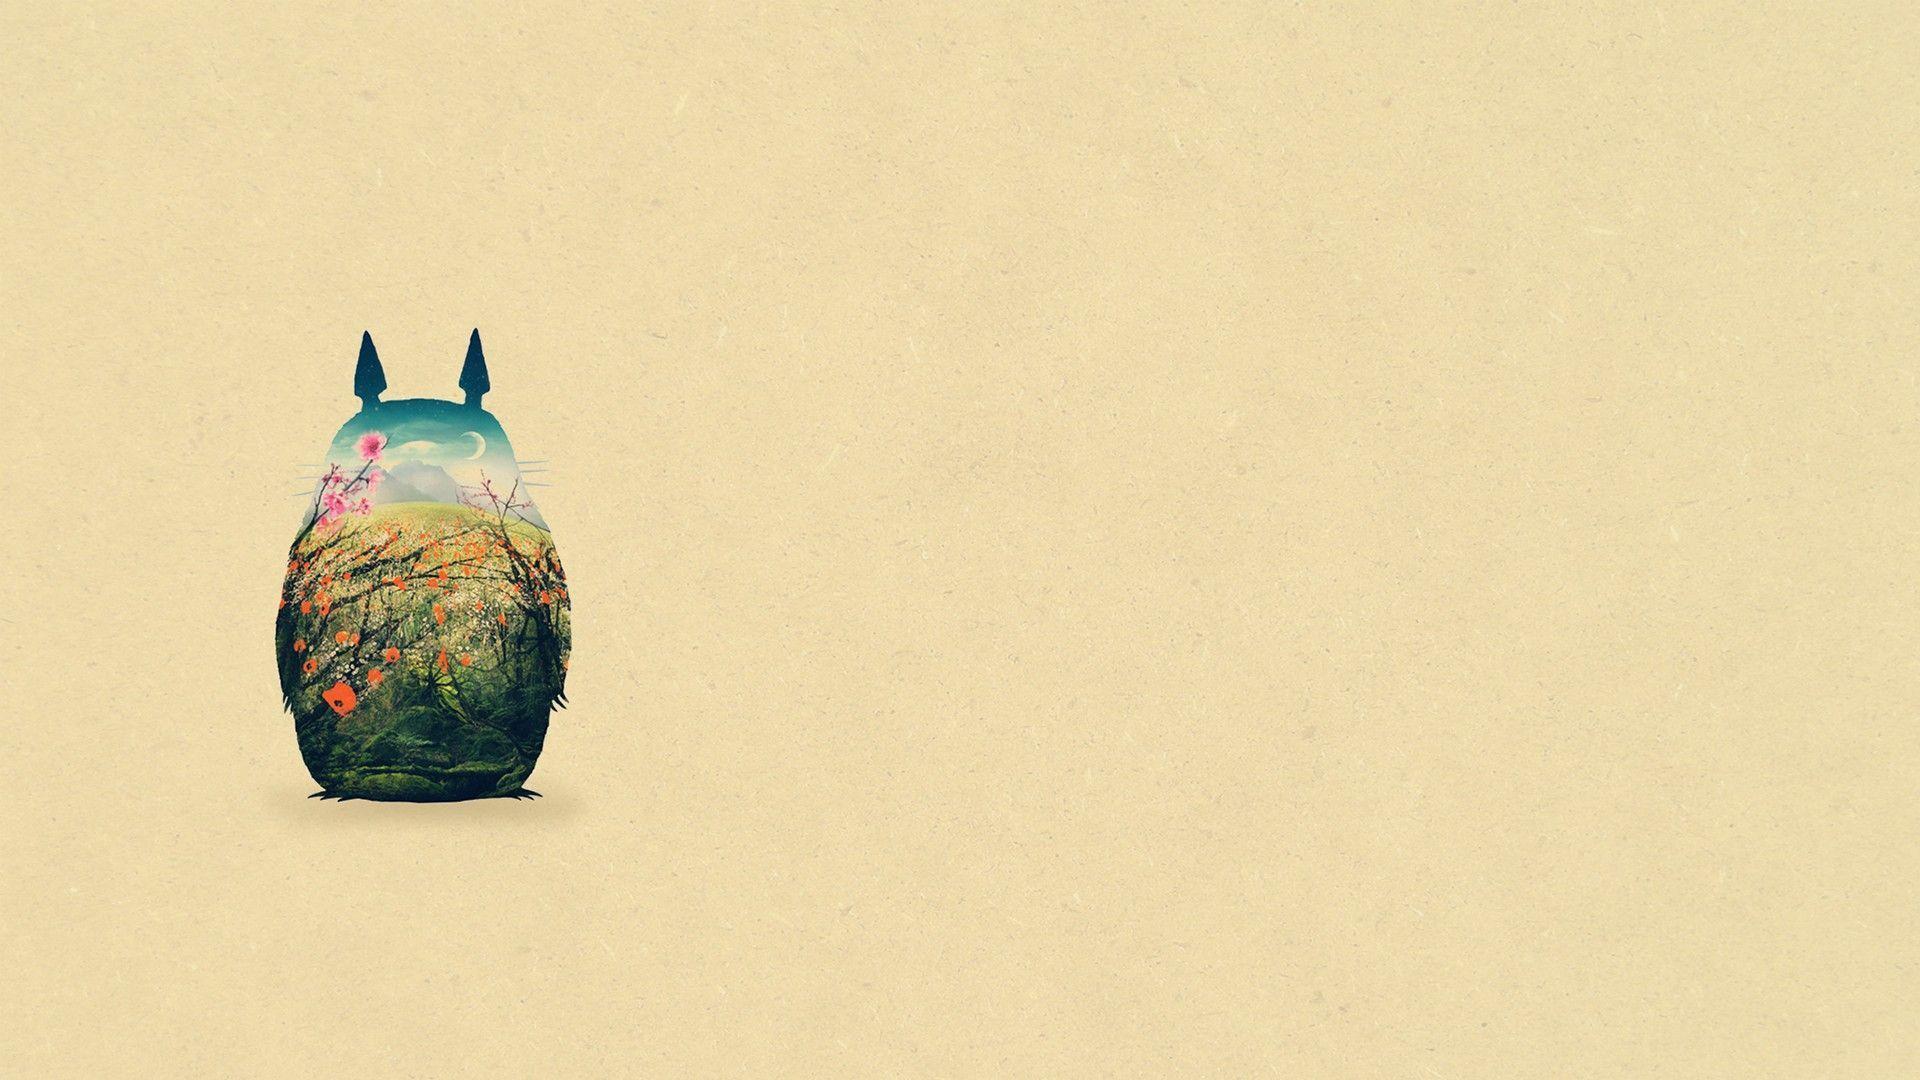 Totoro Wallpapers HD